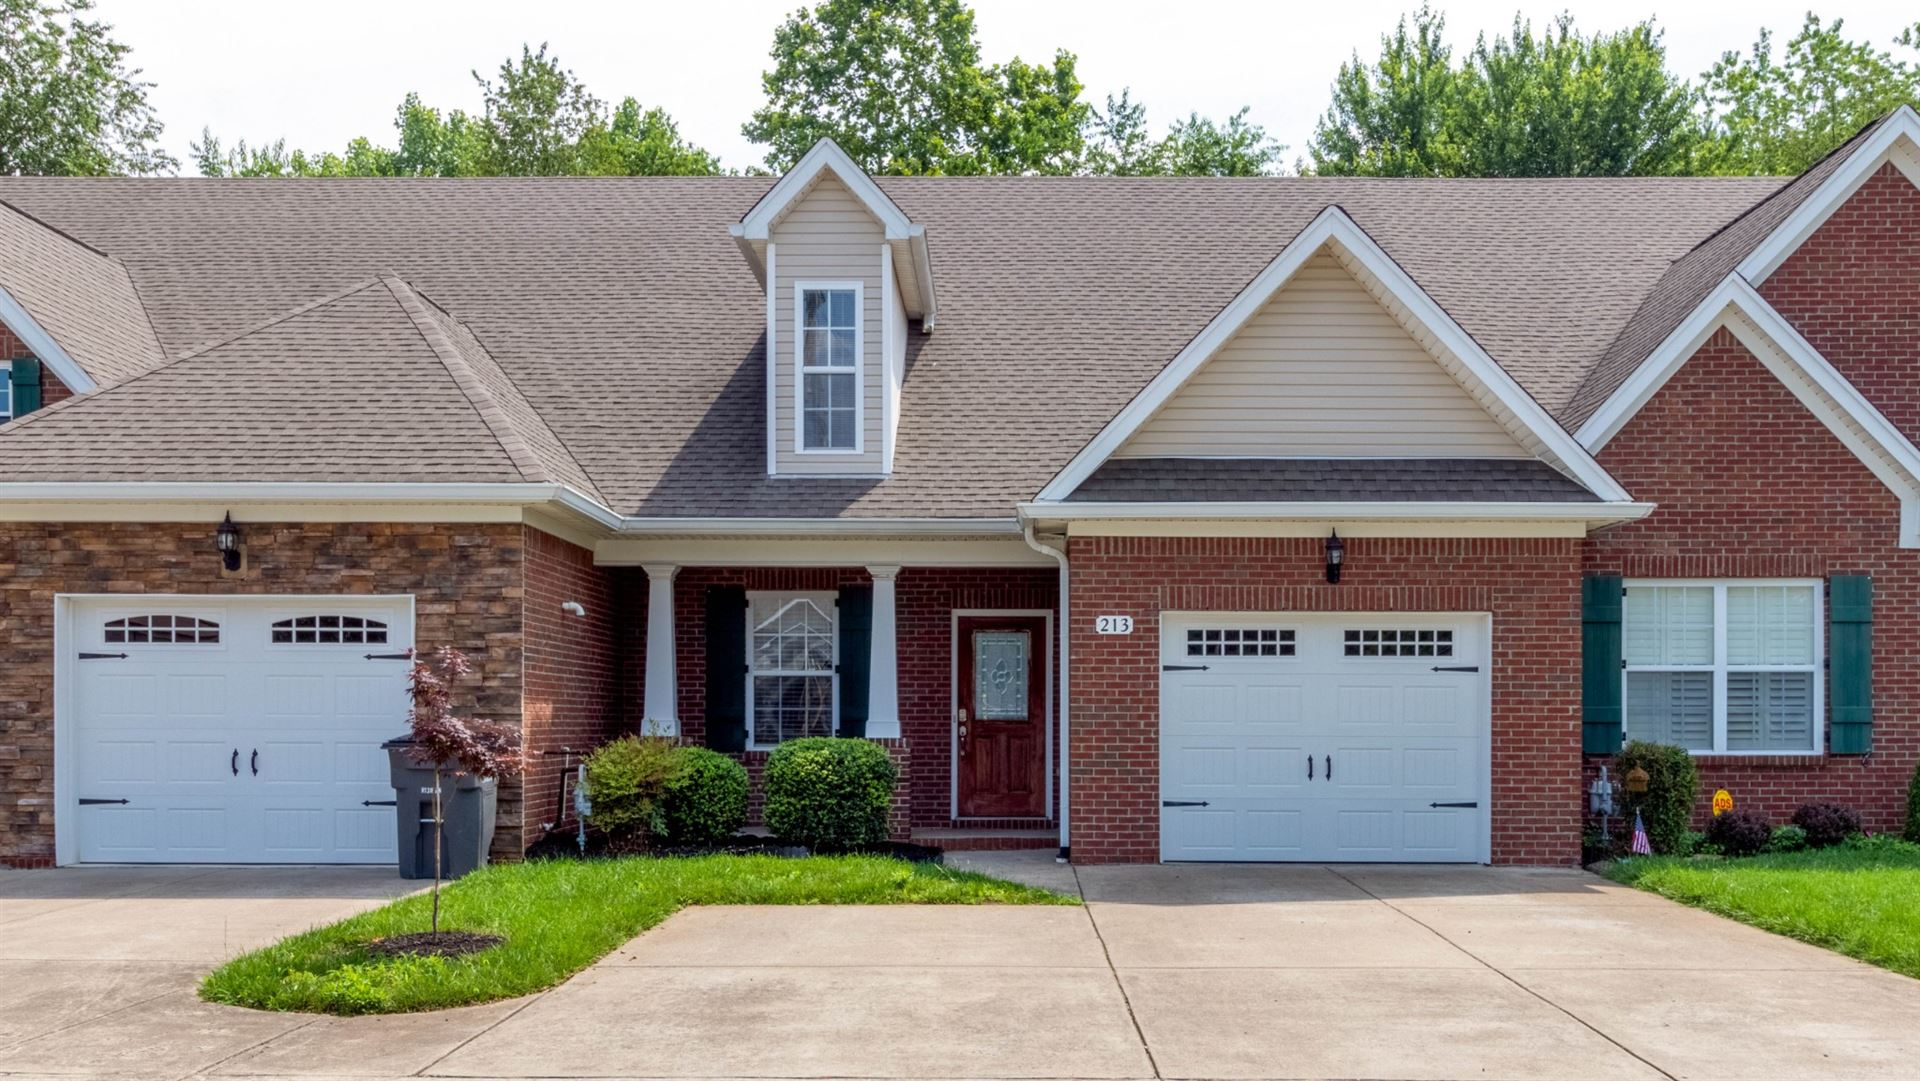 213 Hillcrest Dr, Clarksville, TN 37043 - MLS#: 2262528